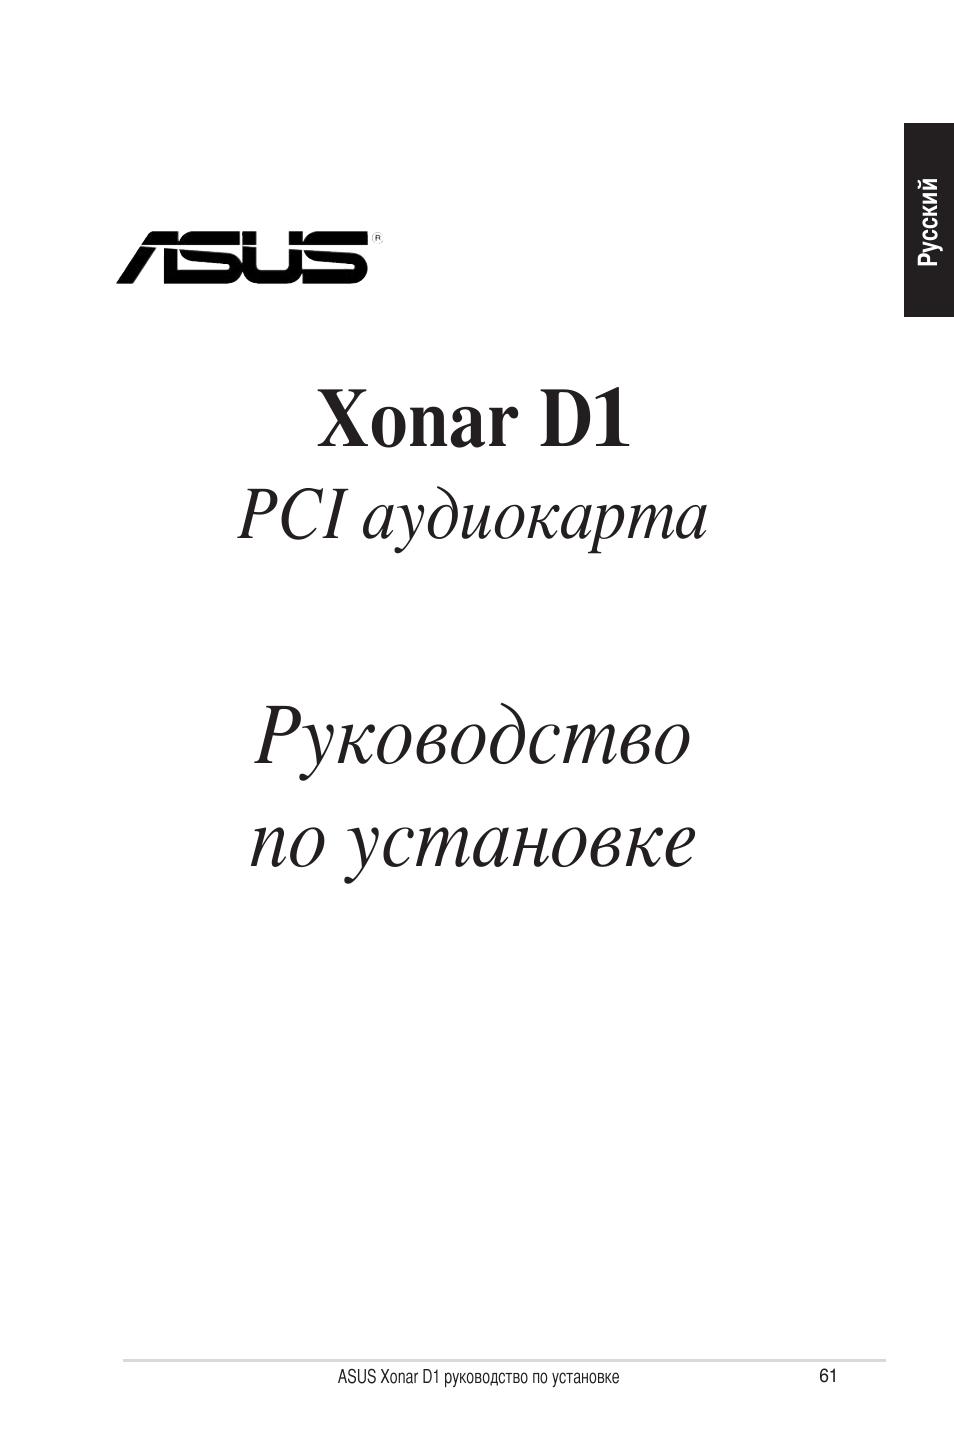 Asus xonar d1 инструкция на русском tebubbbuy's blog.